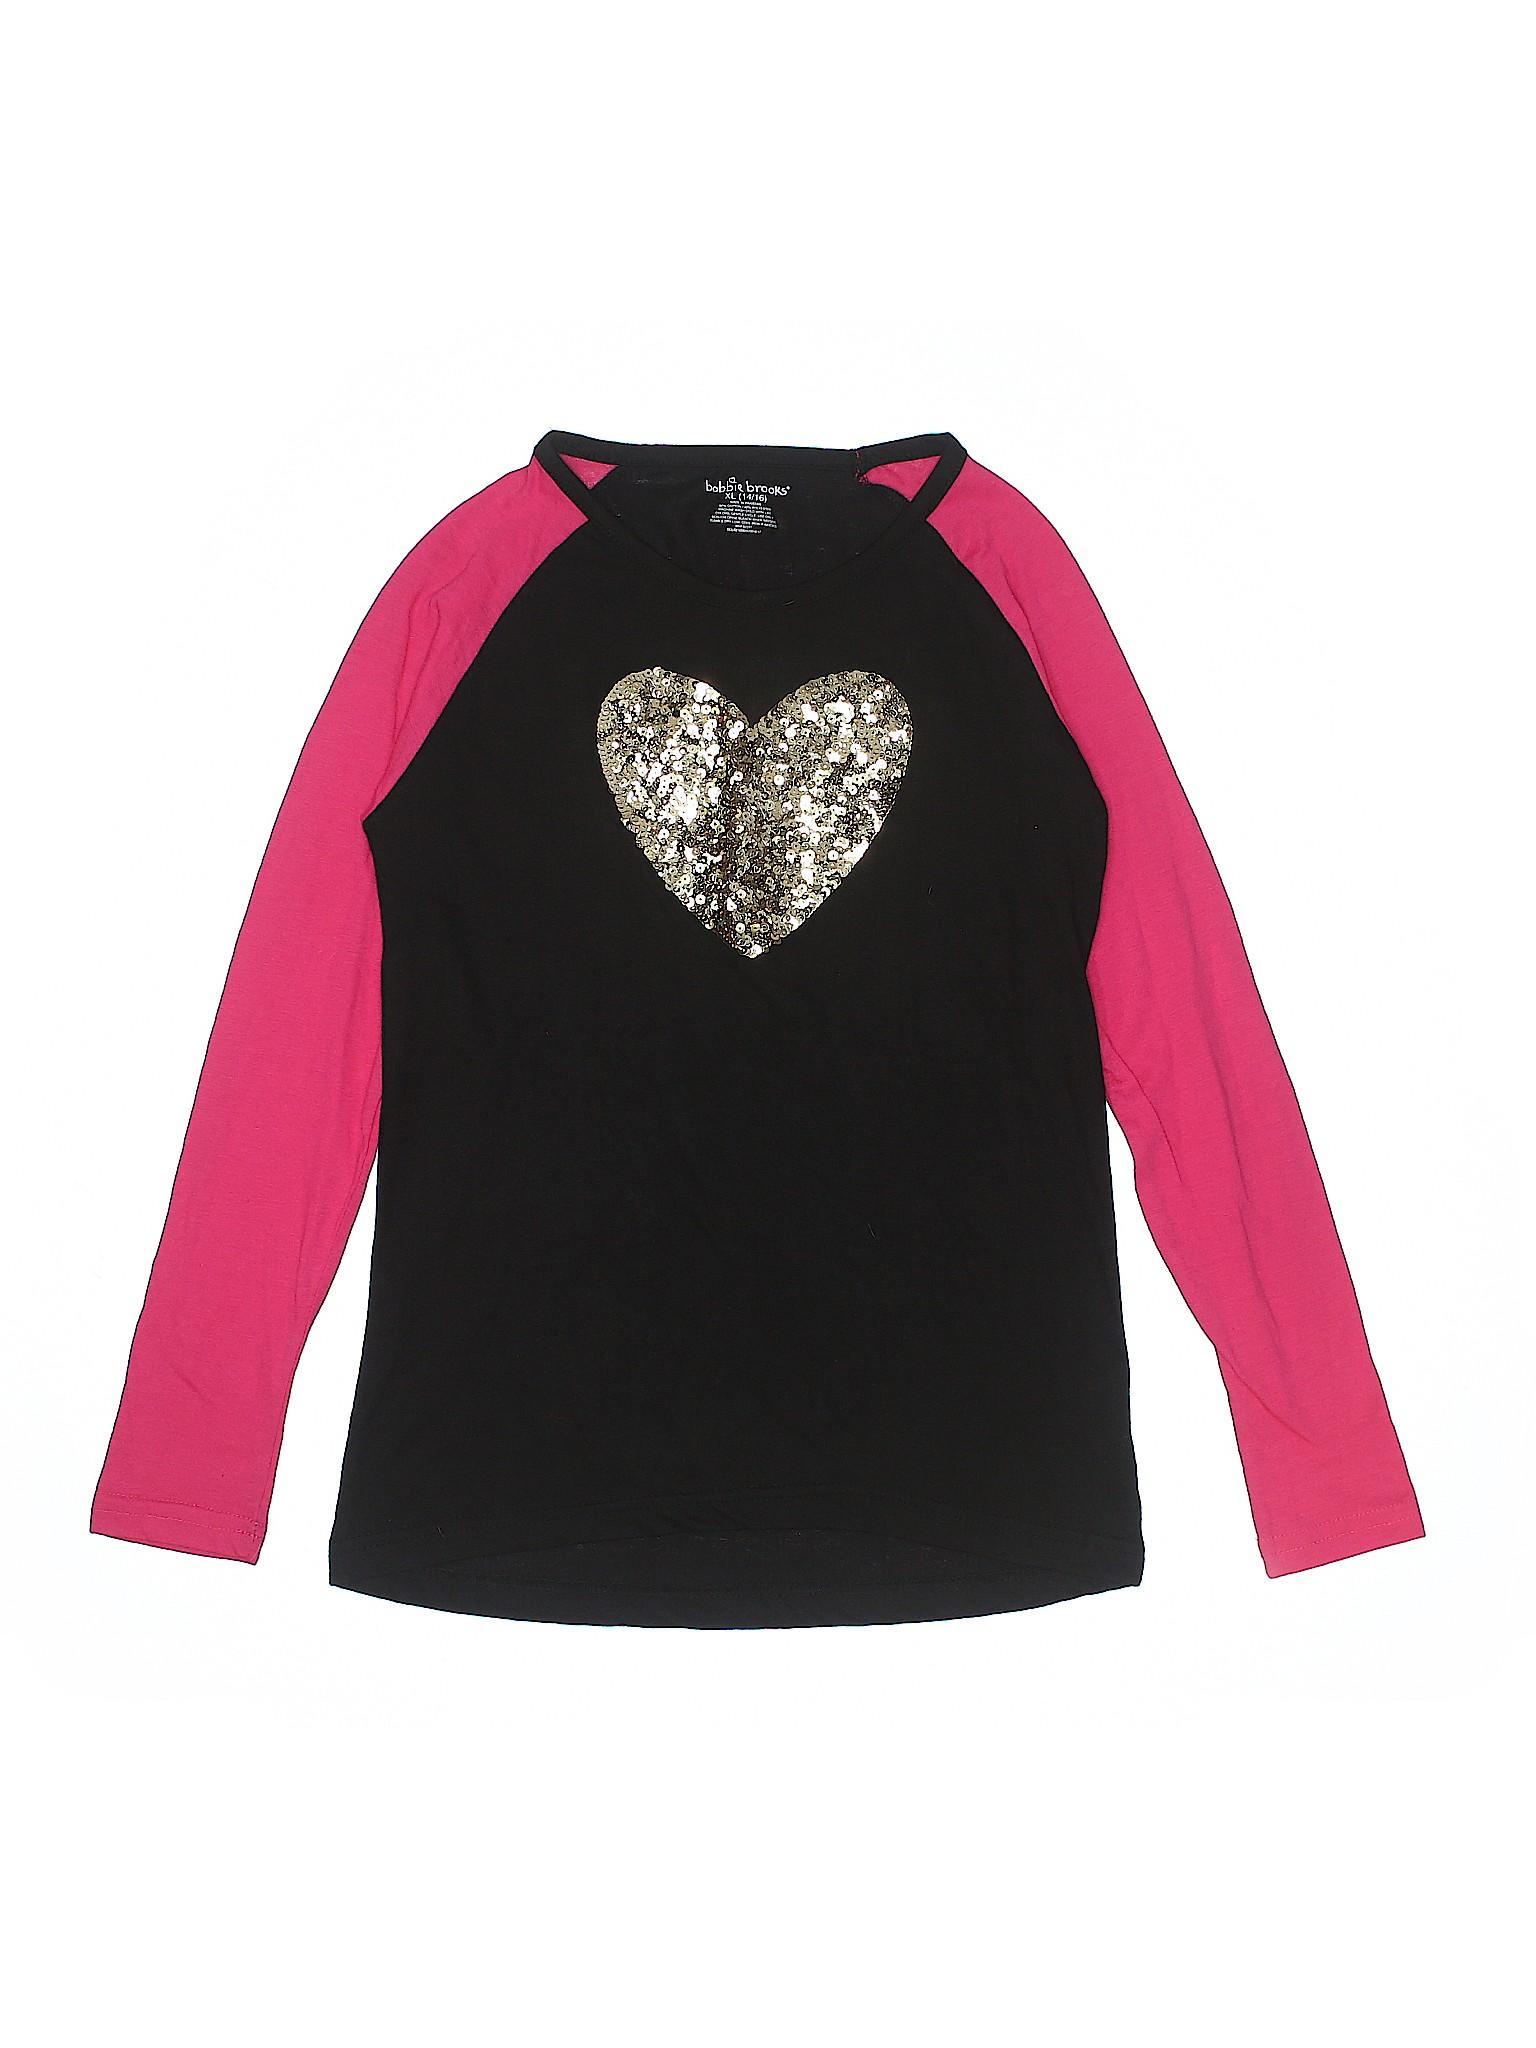 ab6f8dbc59e2d Bobbie Brooks Girls  Clothing On Sale Up To 90% Off Retail